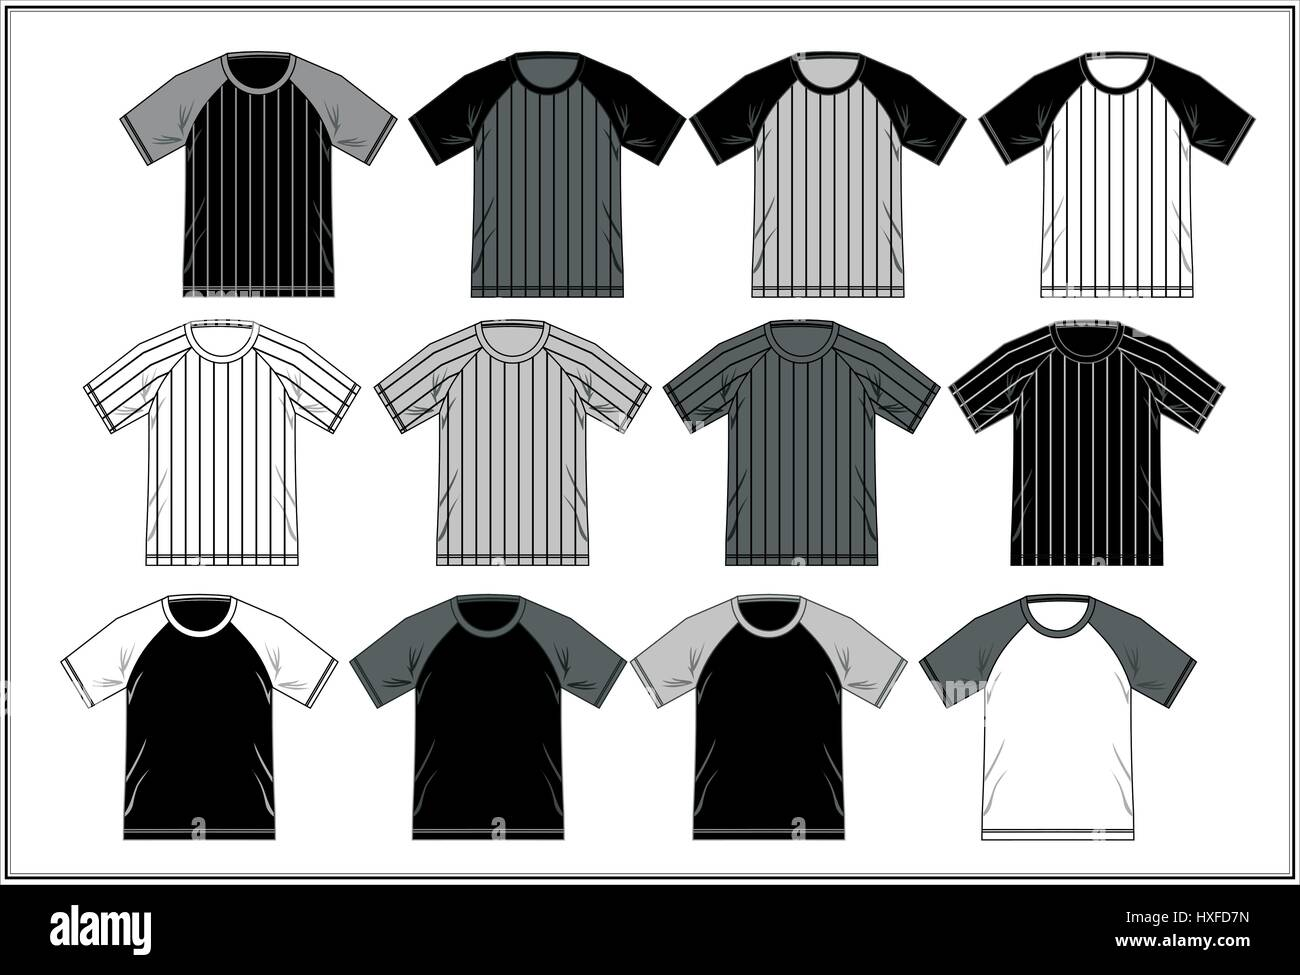 T Shirt Template Raglan Black And White, Vector - Stock Image